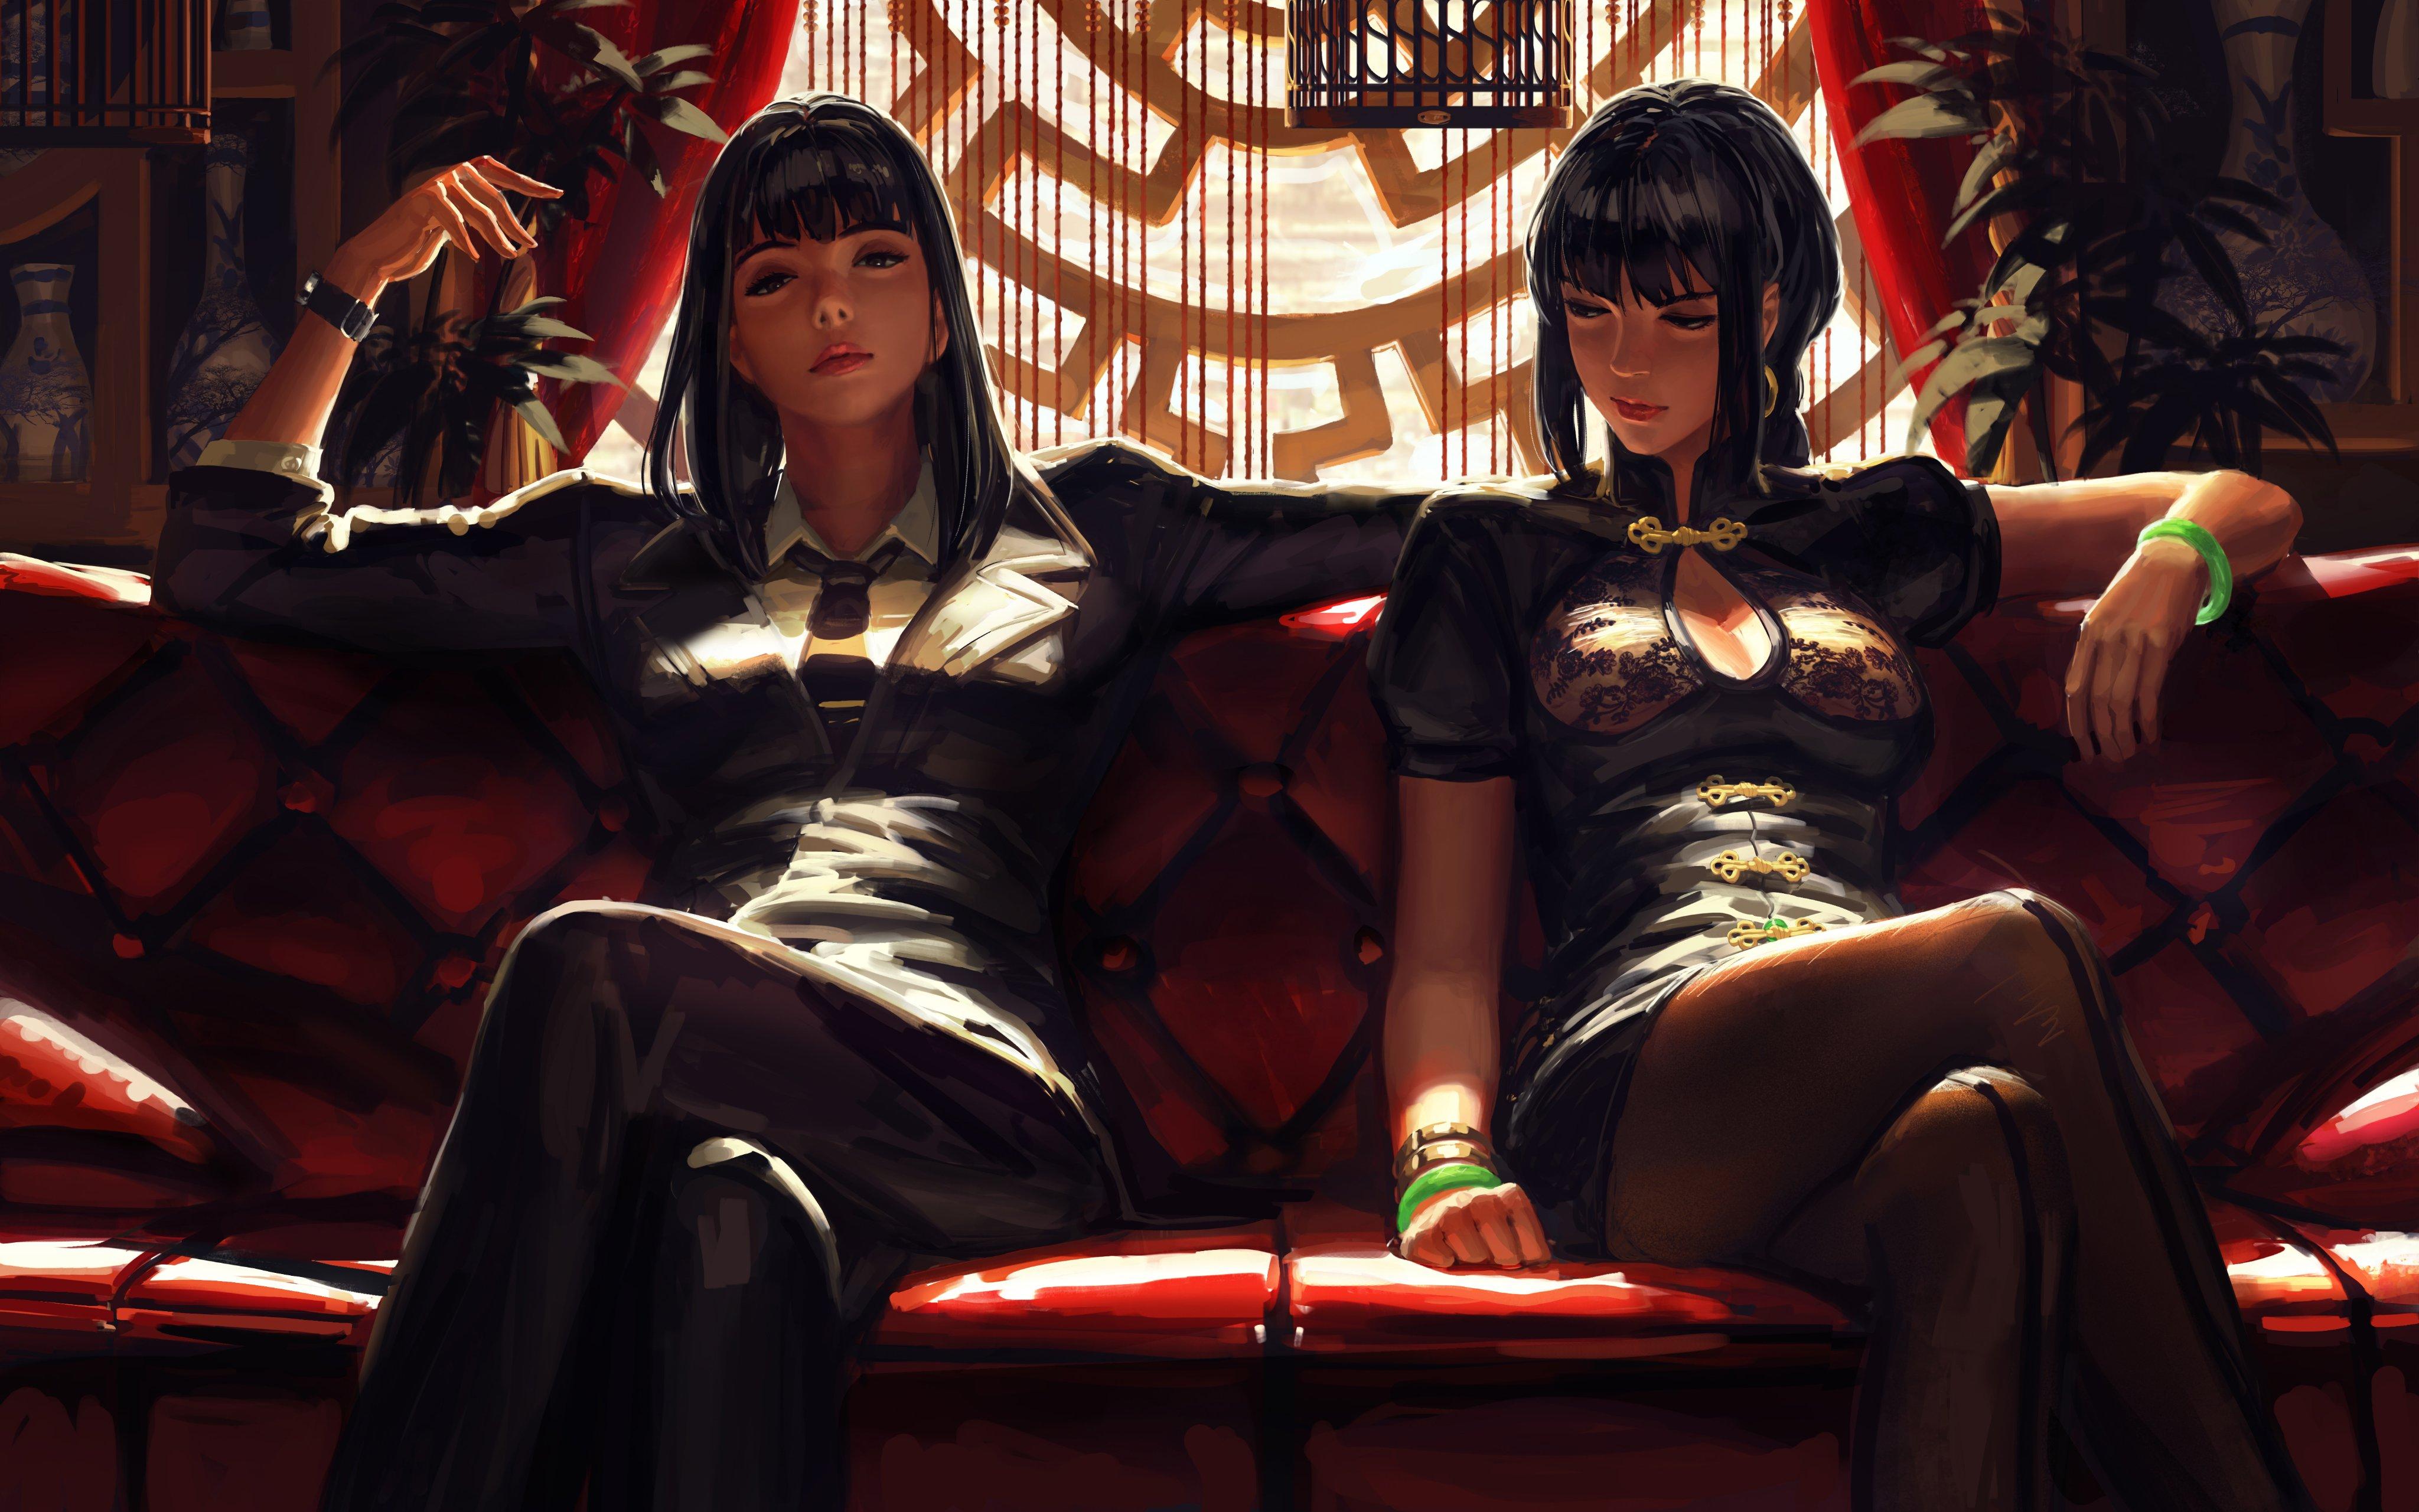 General 4096x2561 GUWEIZ original characters artwork digital art black hair long hair legs crossed anime anime girls two women sitting 2D cleavage Chinese dress pantyhose looking at viewer frontal view